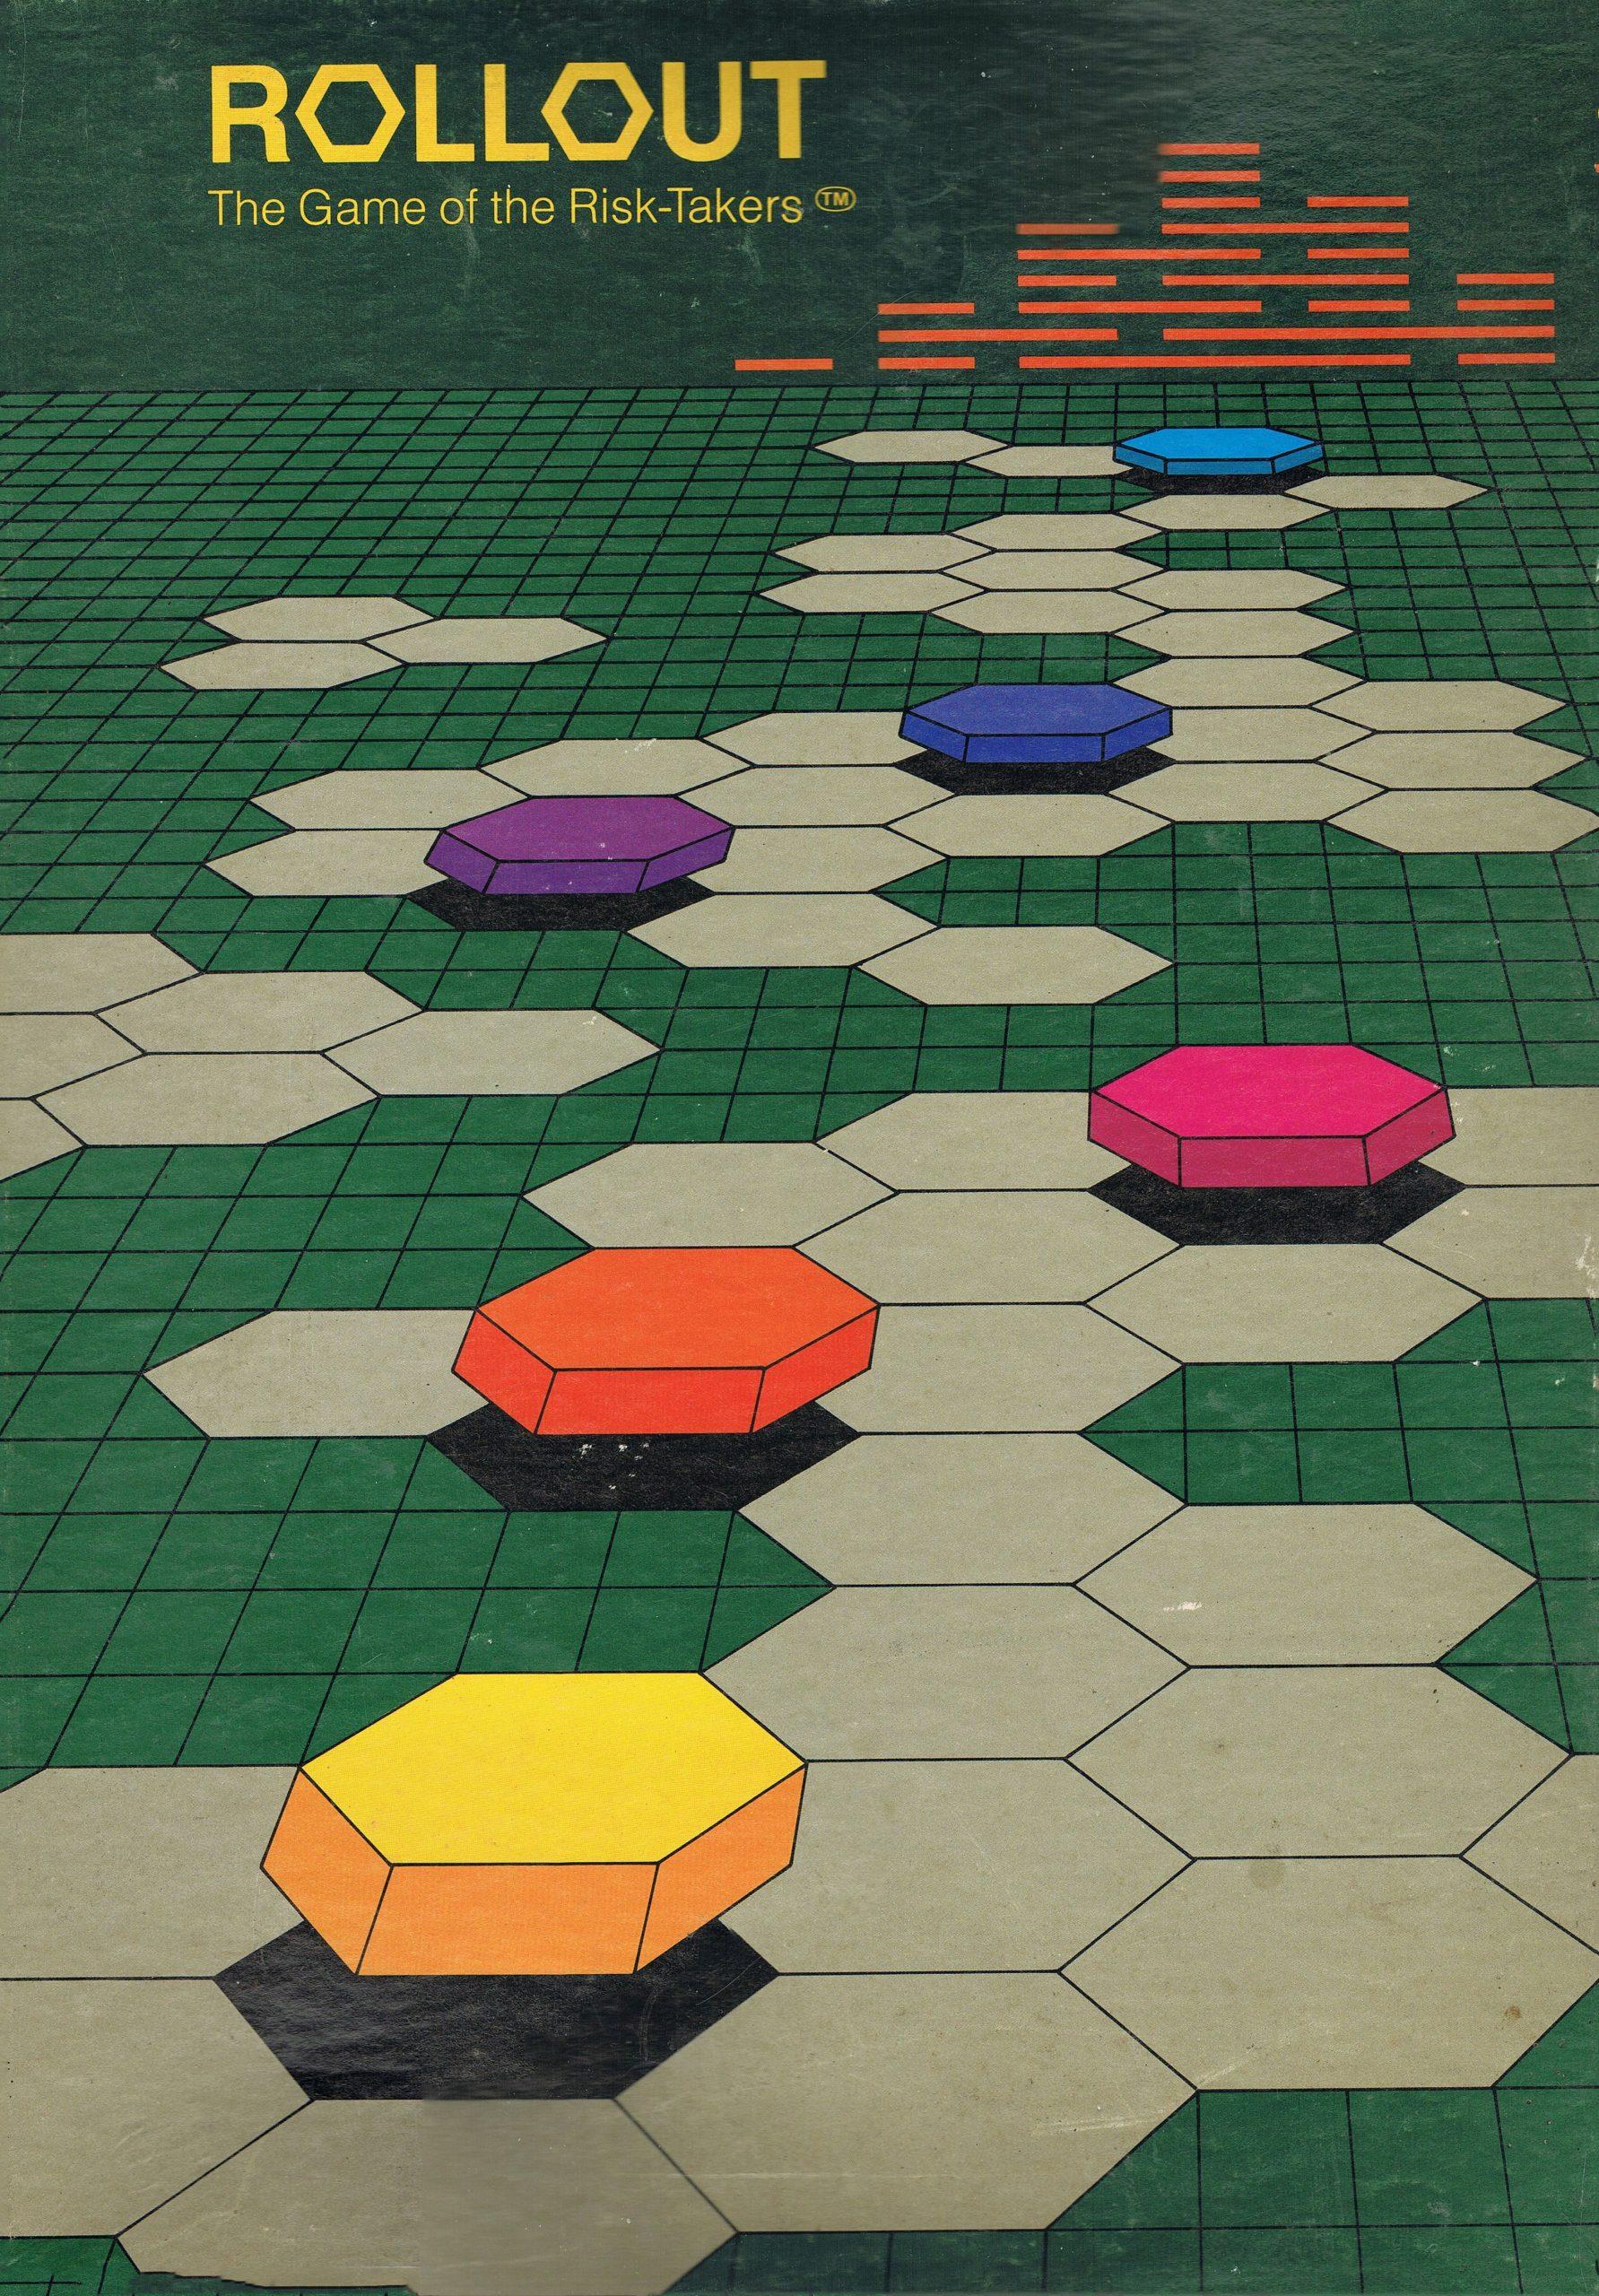 настольная игра Rollout: The Game of the Risk-Takers Внедрение: игра любителей риска